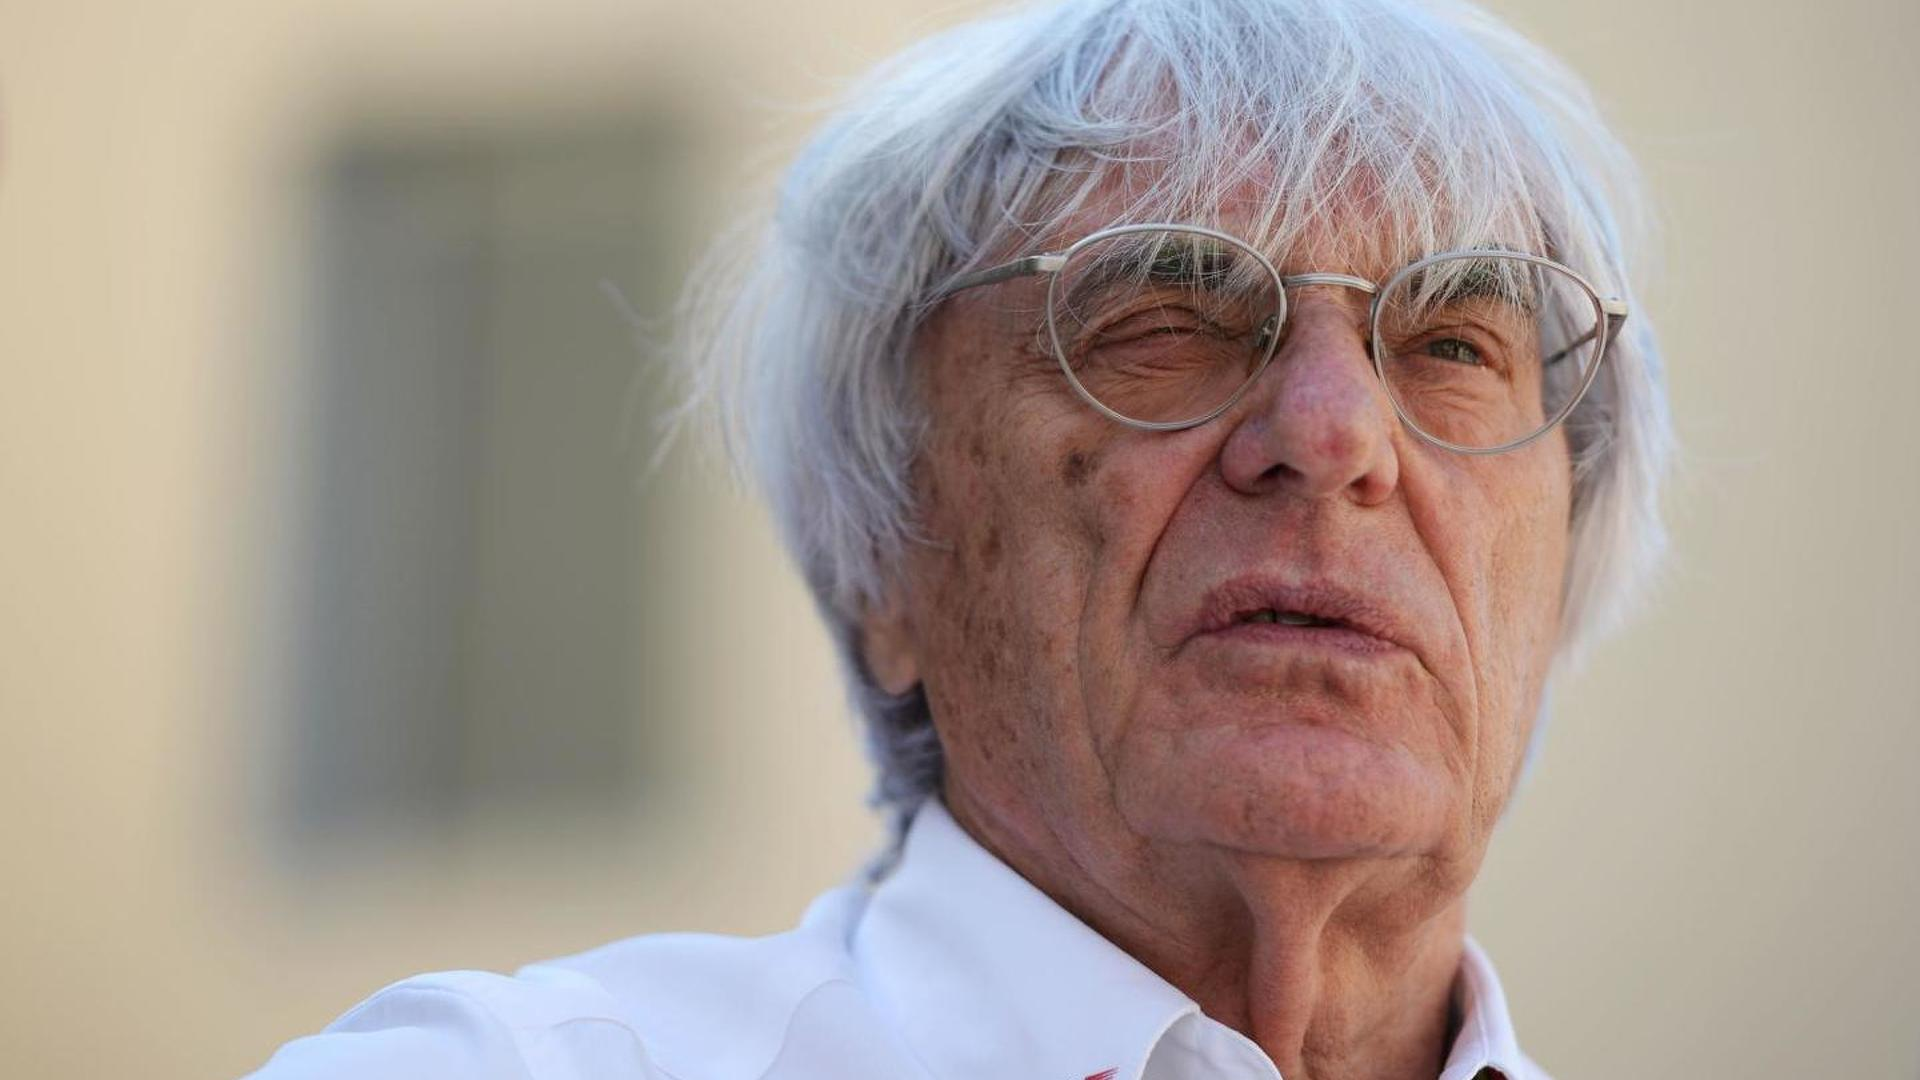 New F1 boss to 'rein in' Ecclestone - report